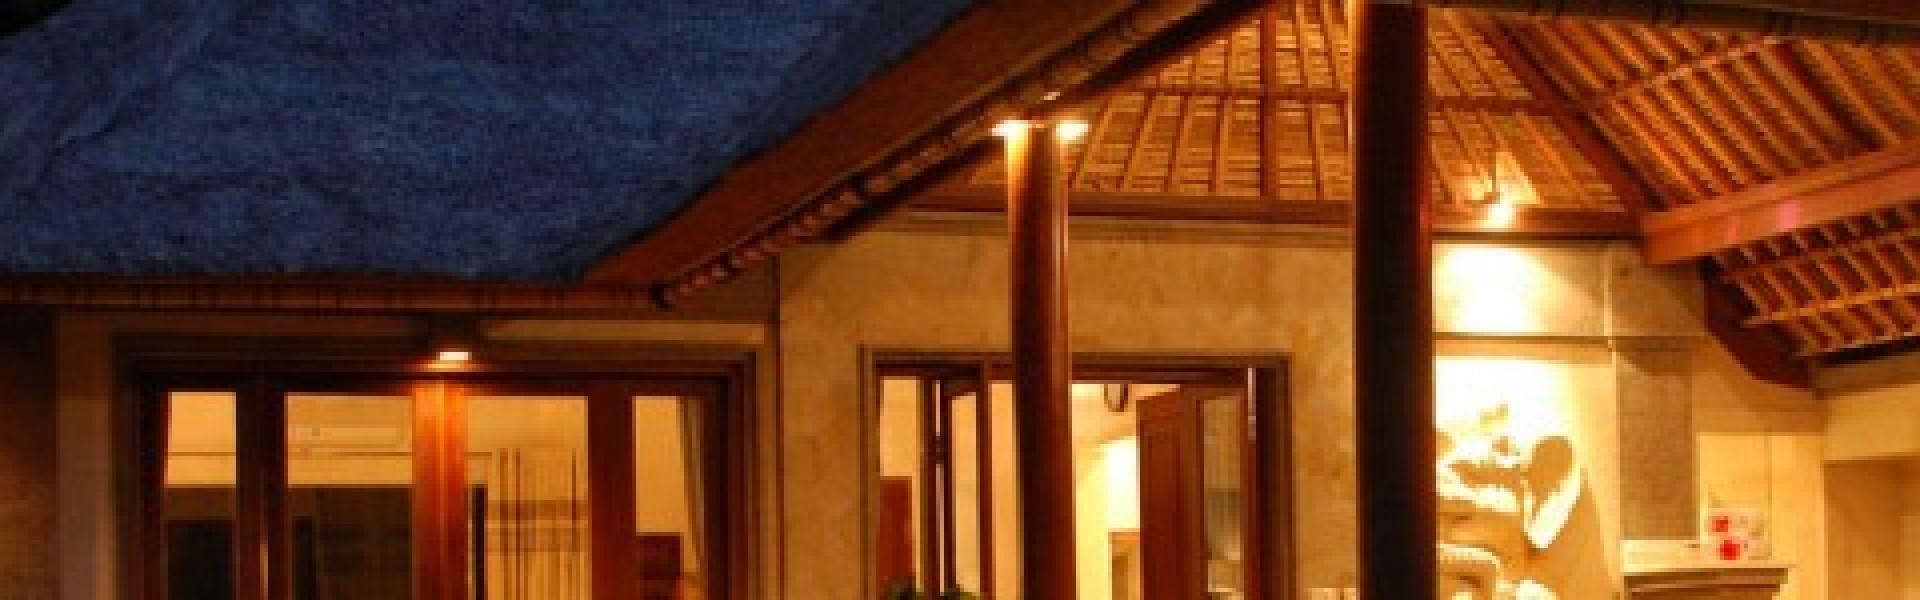 Bali SMB Carpenter